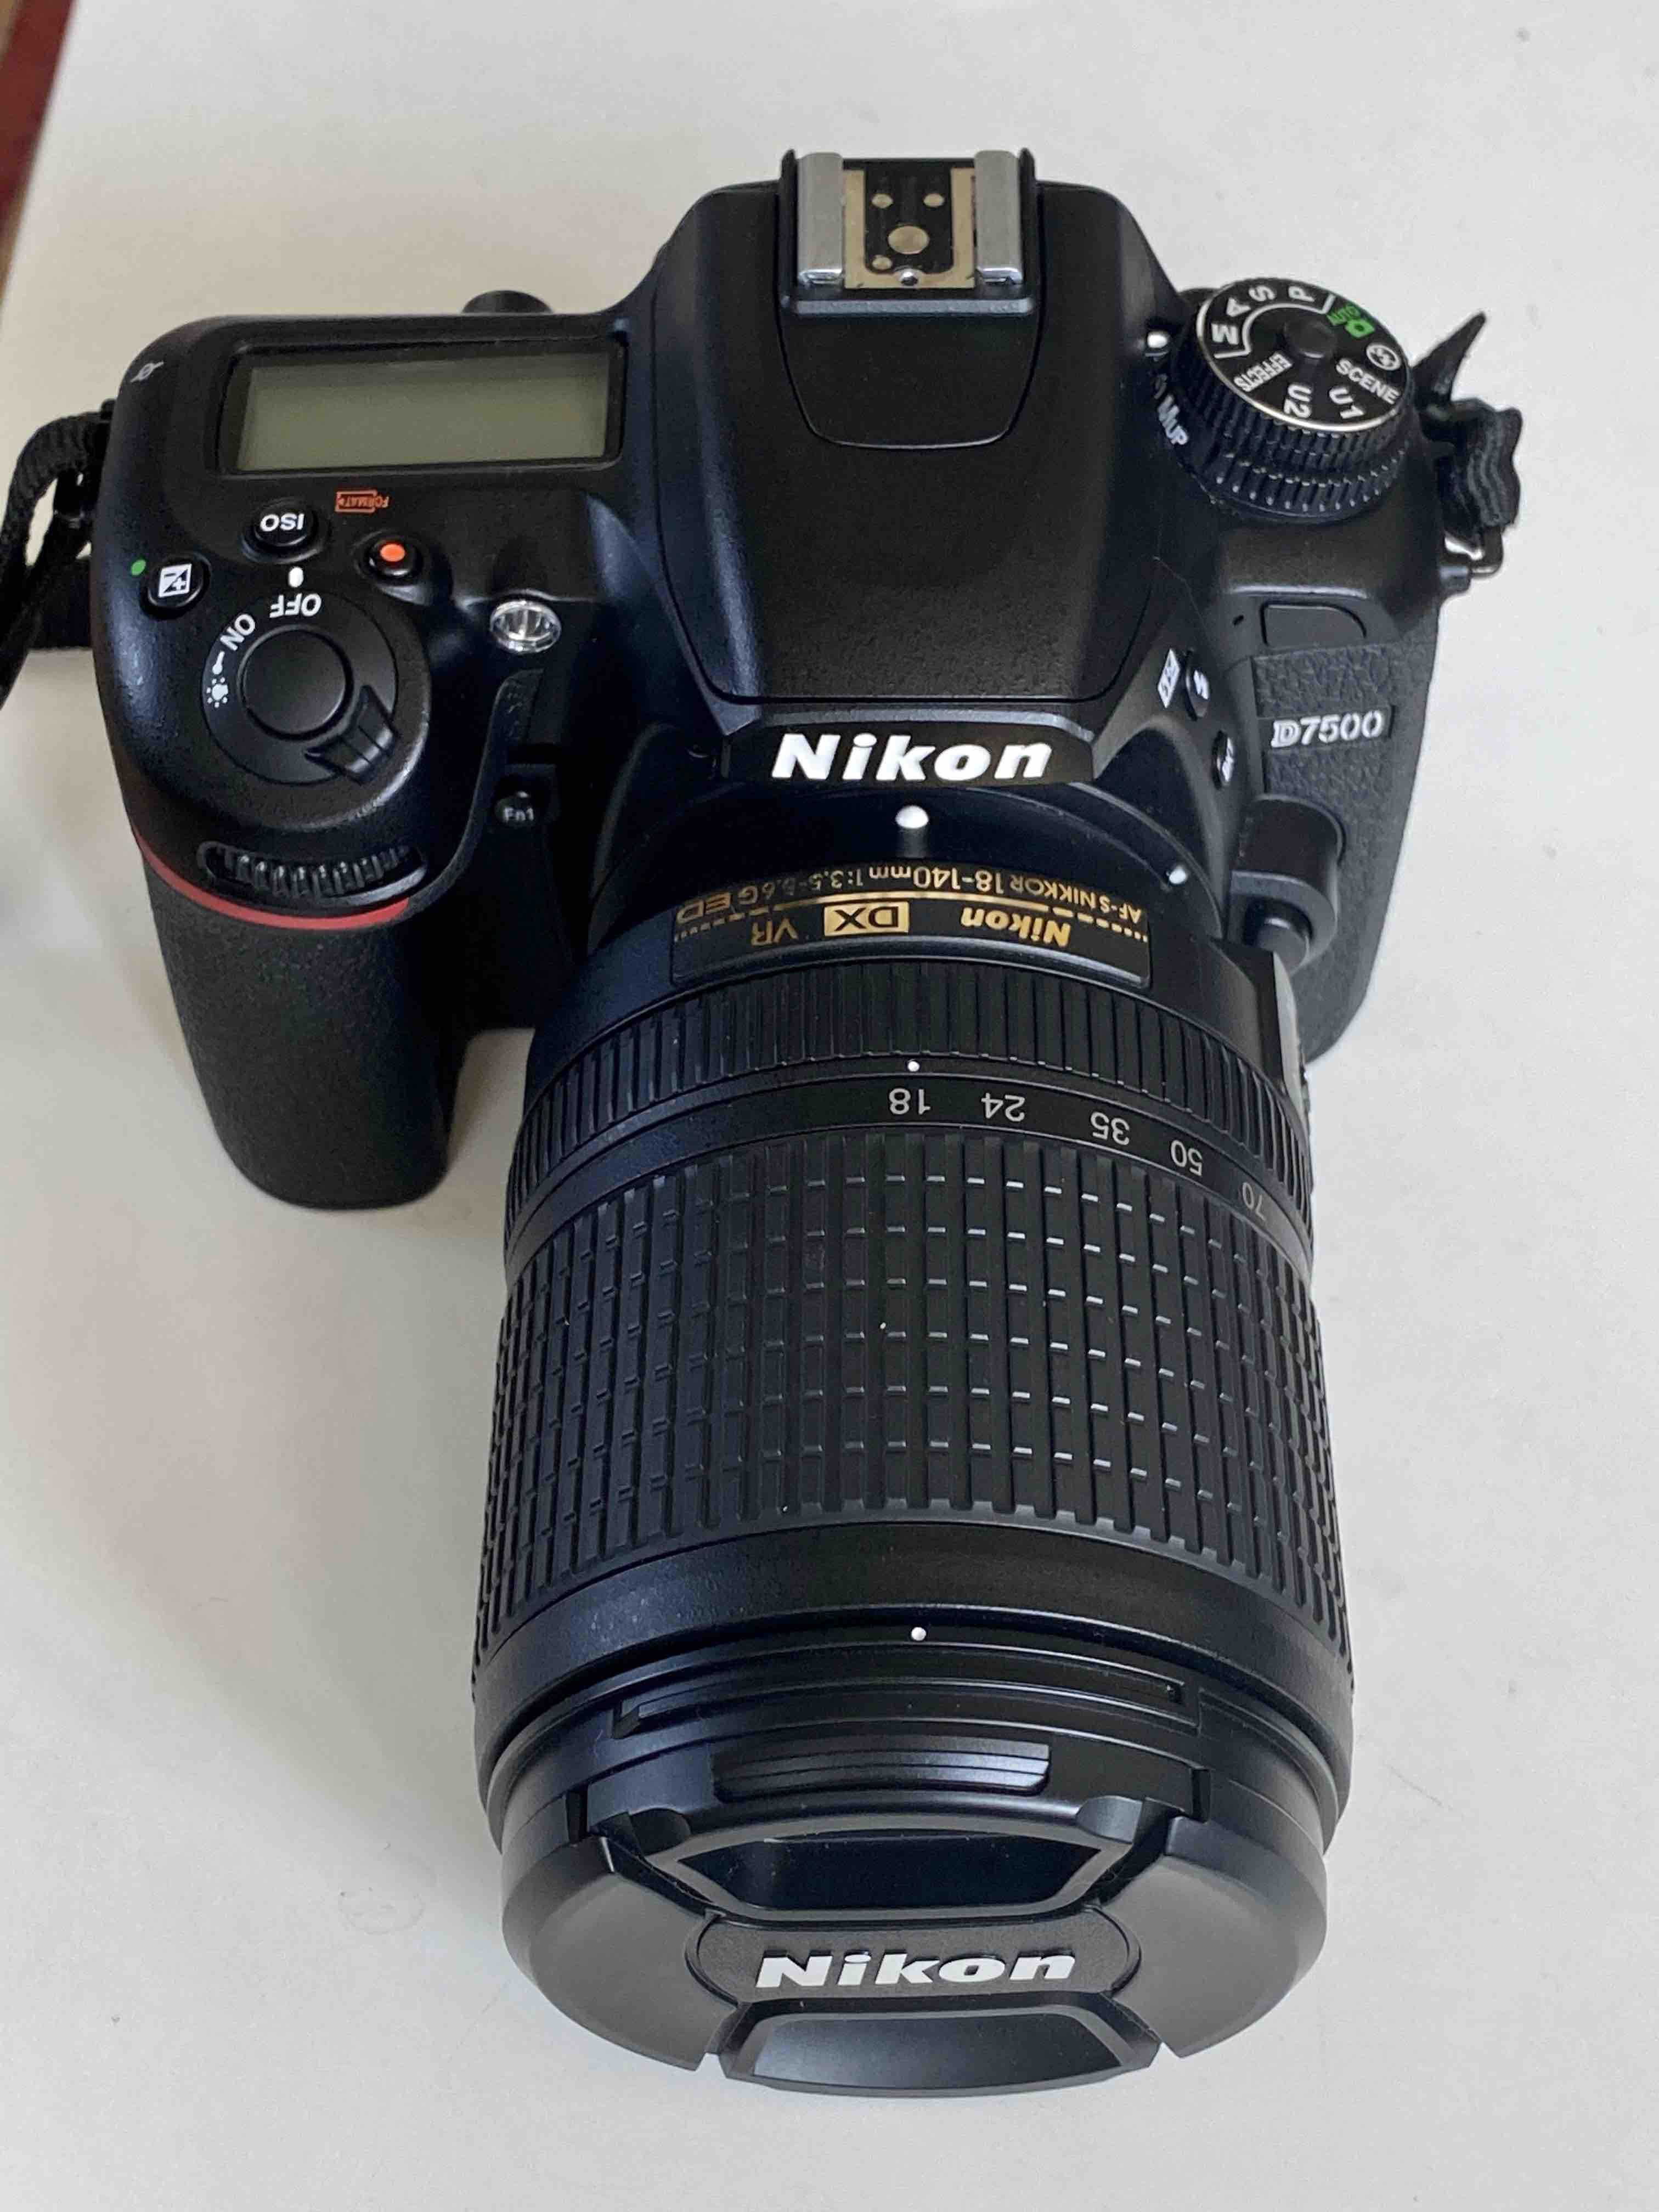 Reflex Nikon D7500 + Objectifs AFS 18-105 et 35mm